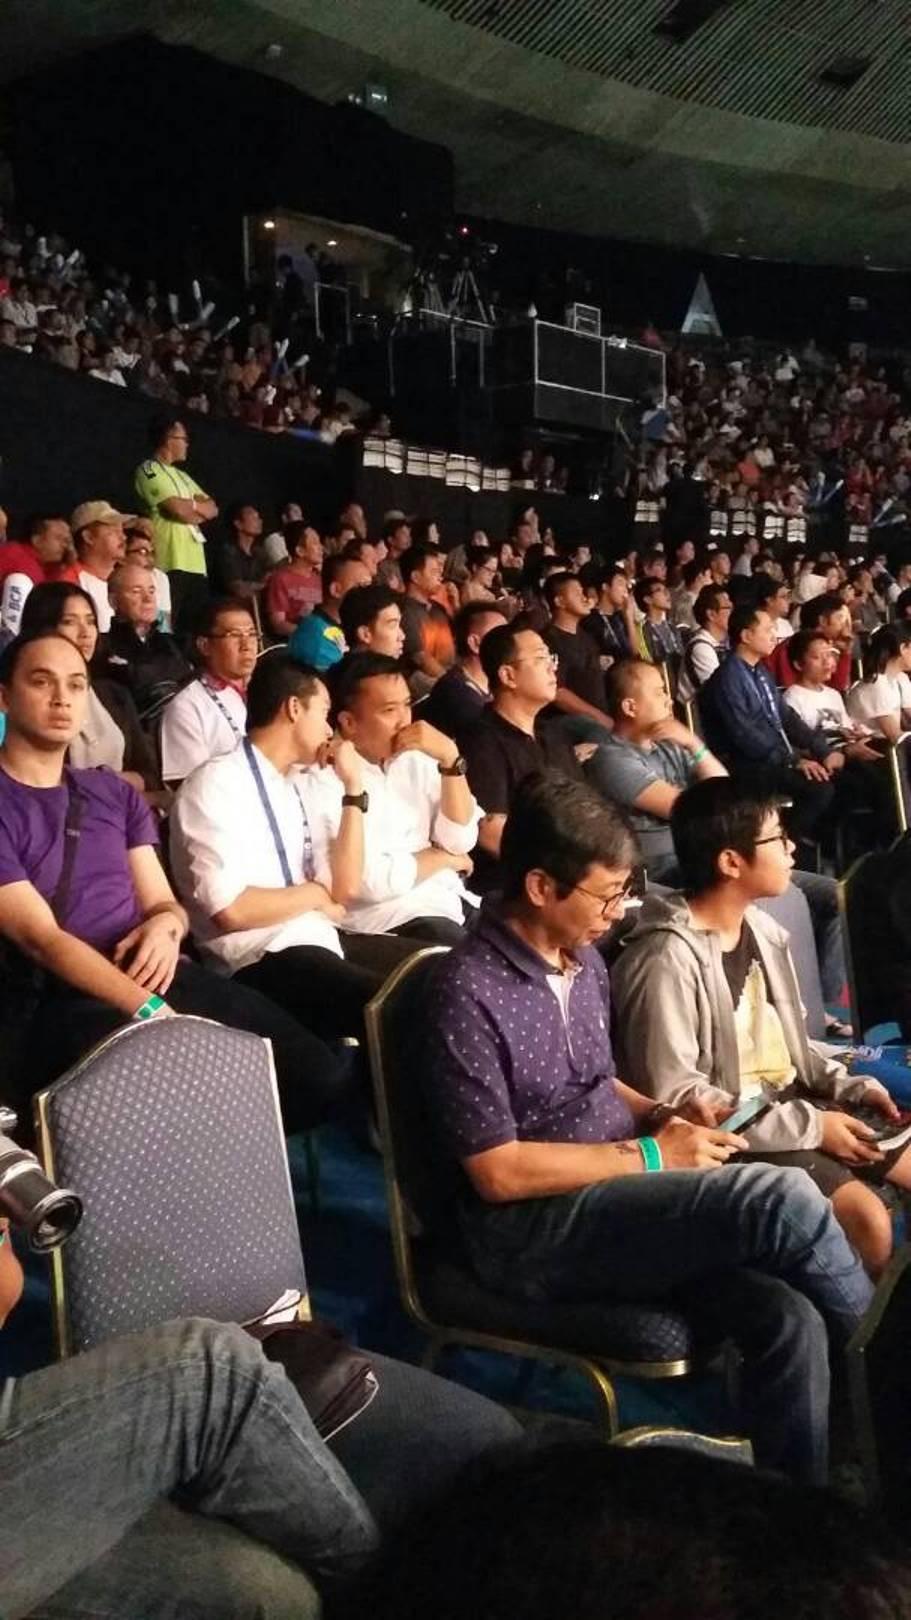 Menteri Pemuda dan Olahraga Imam Nahrawi menyaksikan langsung pertandingan Indonesian Open 2017 di Plenary Hall Jakarta Convention Center, Senayan, Jakarta, Rabu (14/6/2017). (Liputan6.com/Risa Rahayu Kosasih)